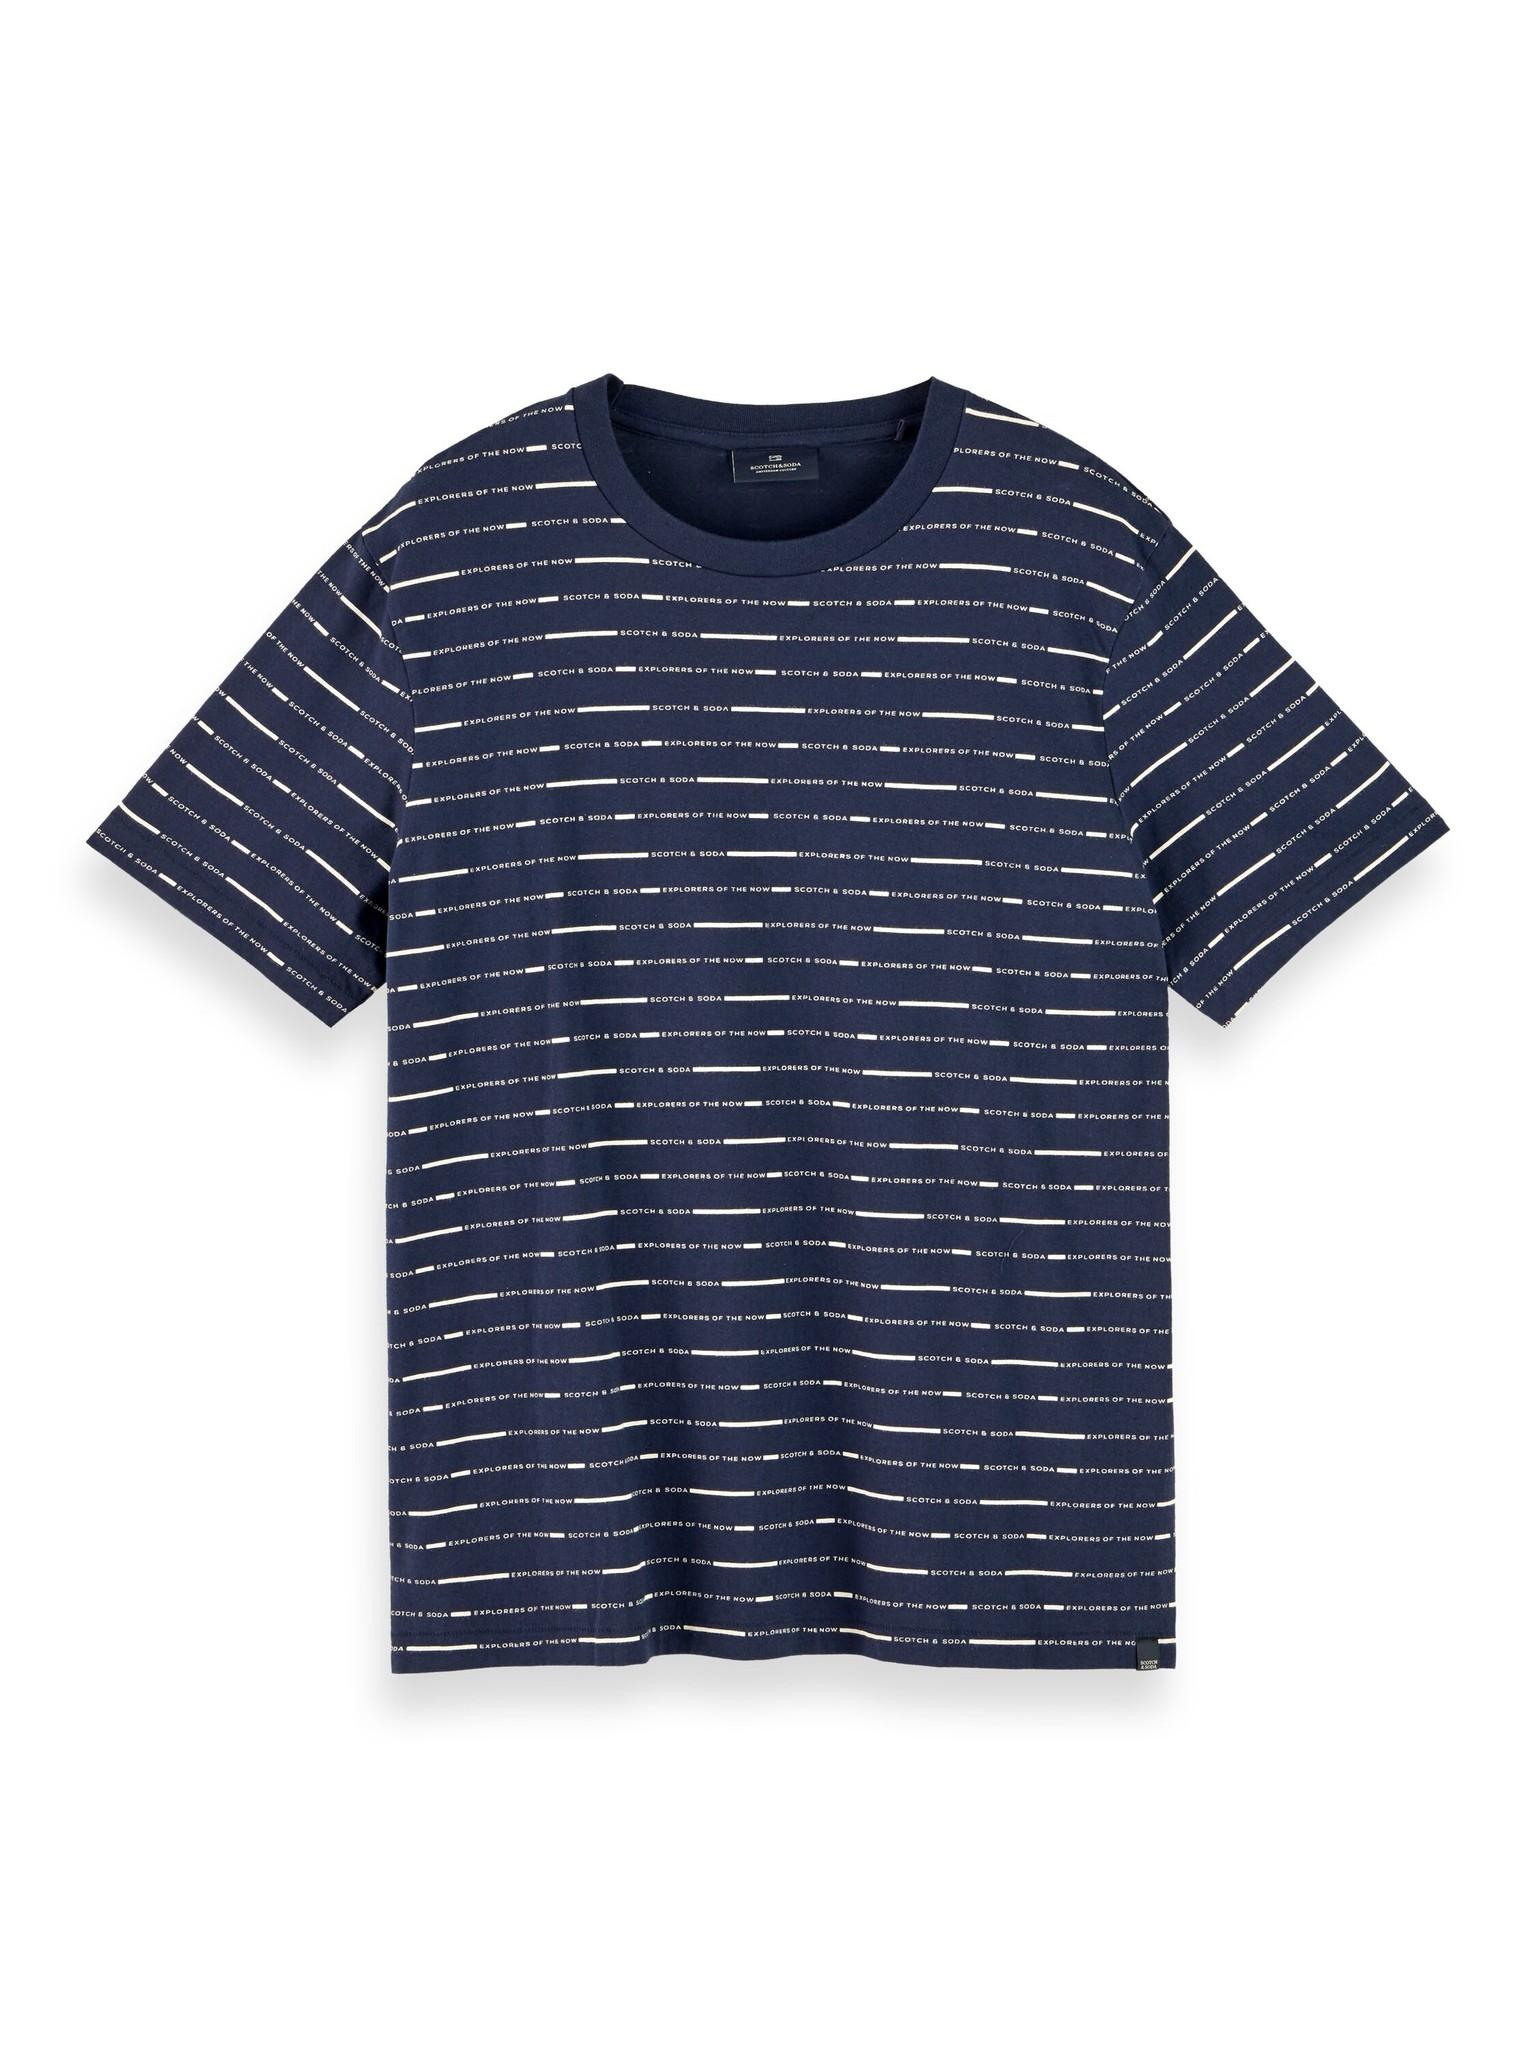 Scotch & Soda T-shirt Scotch & Soda 156803-0220